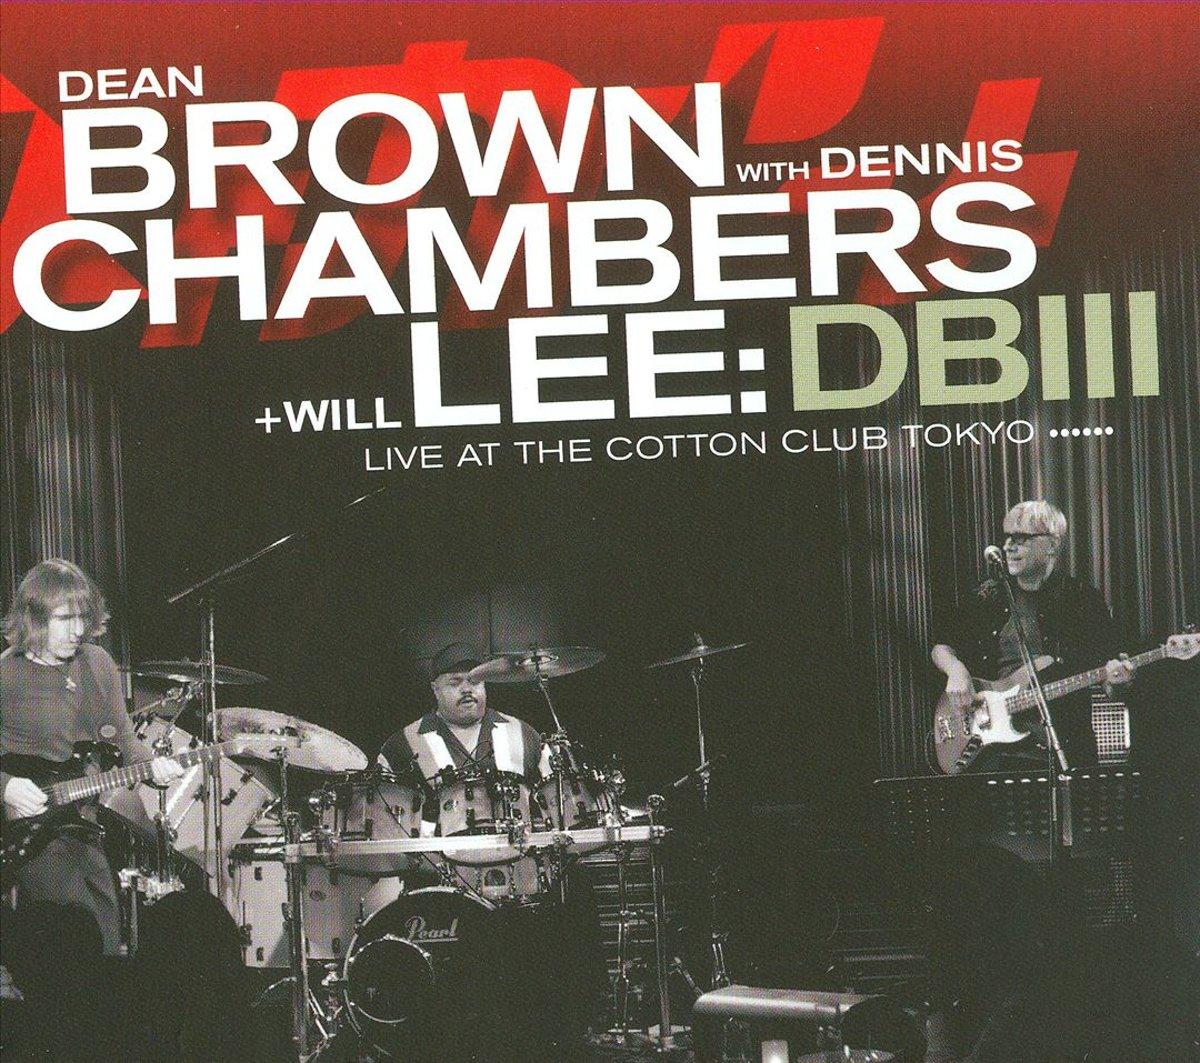 Dean Brown,Деннис Чэмберс Dean Brown, Dennis Chambers. Db III цена